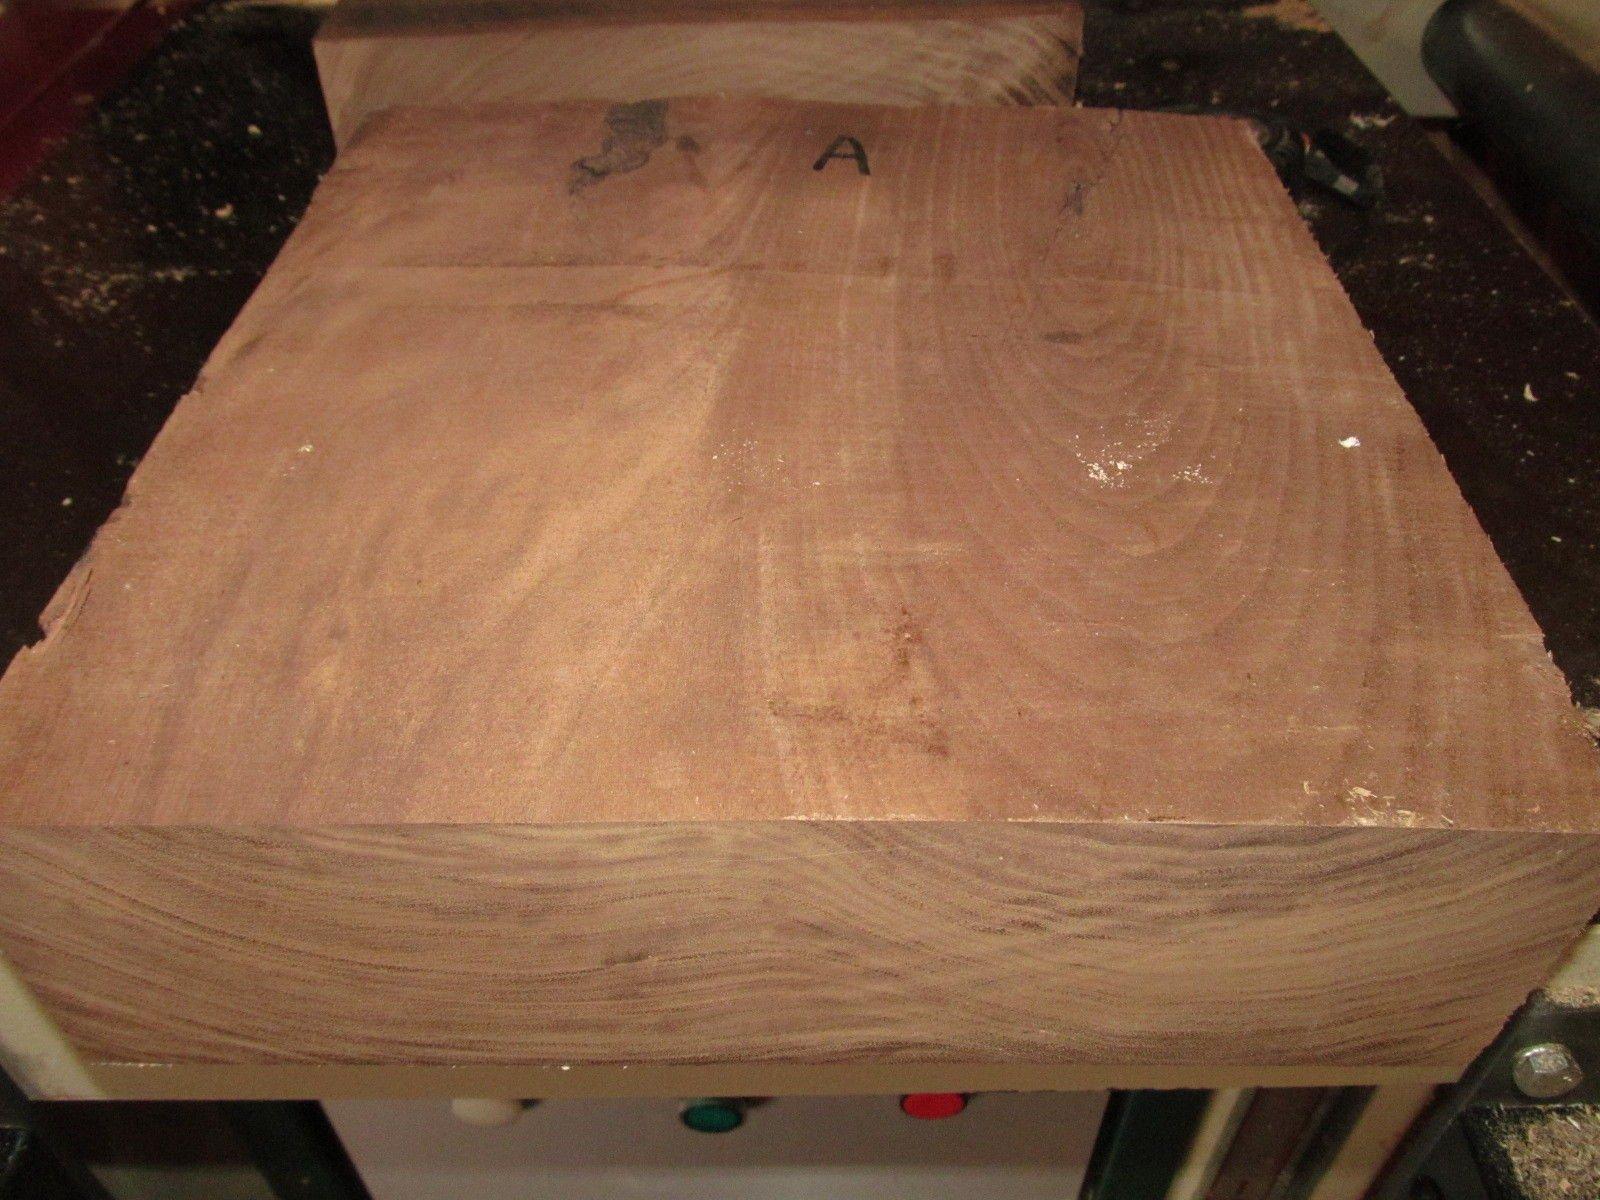 Beautiful KILN Dried Walnut Bowl Blank Lathe Turning Wood Lumber 8 X 8 X 3